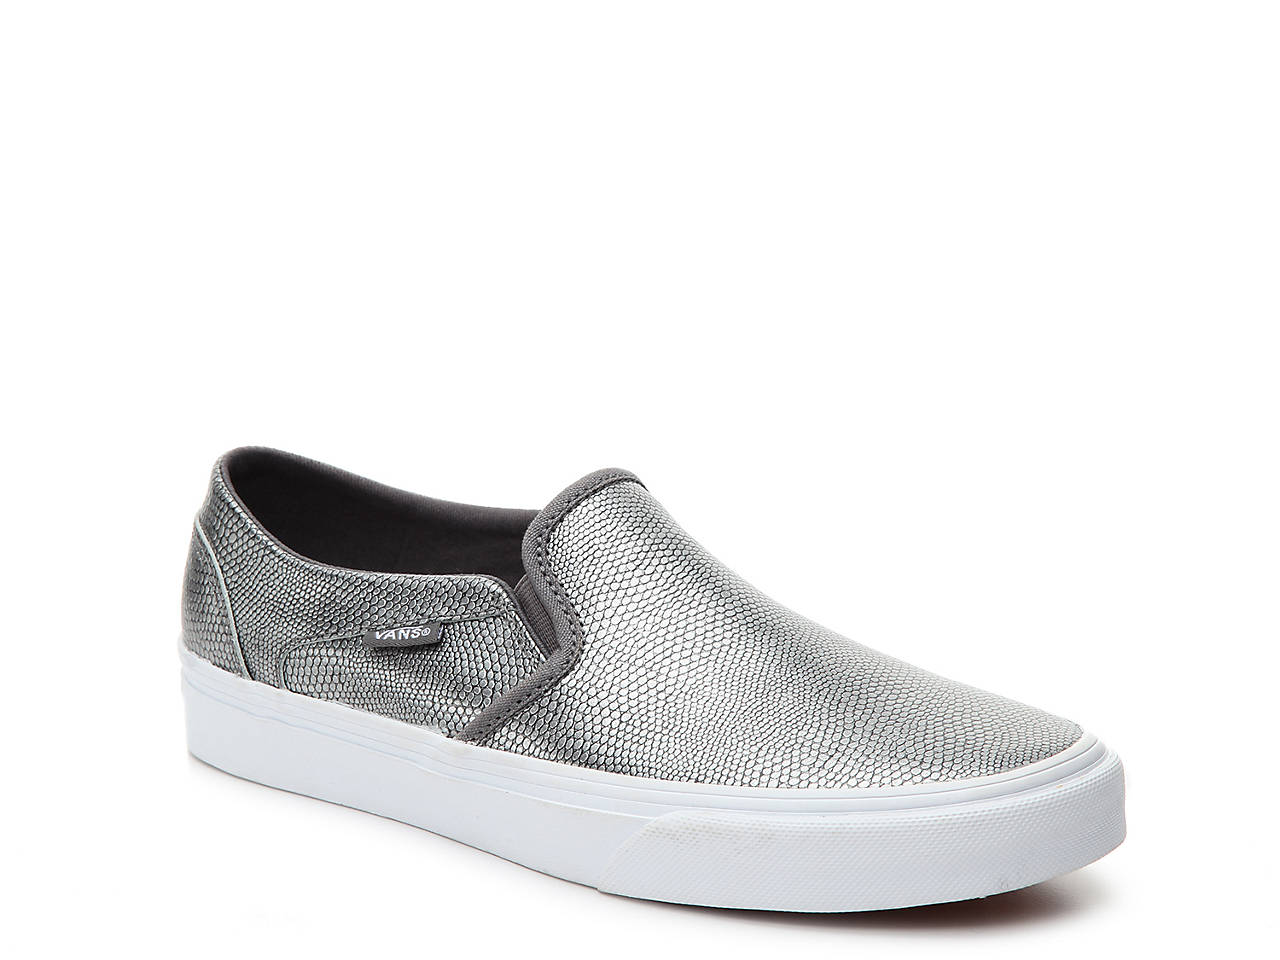 554c7d9d0ea Vans Asher Slip-On Sneaker - Women s Men s Shoes